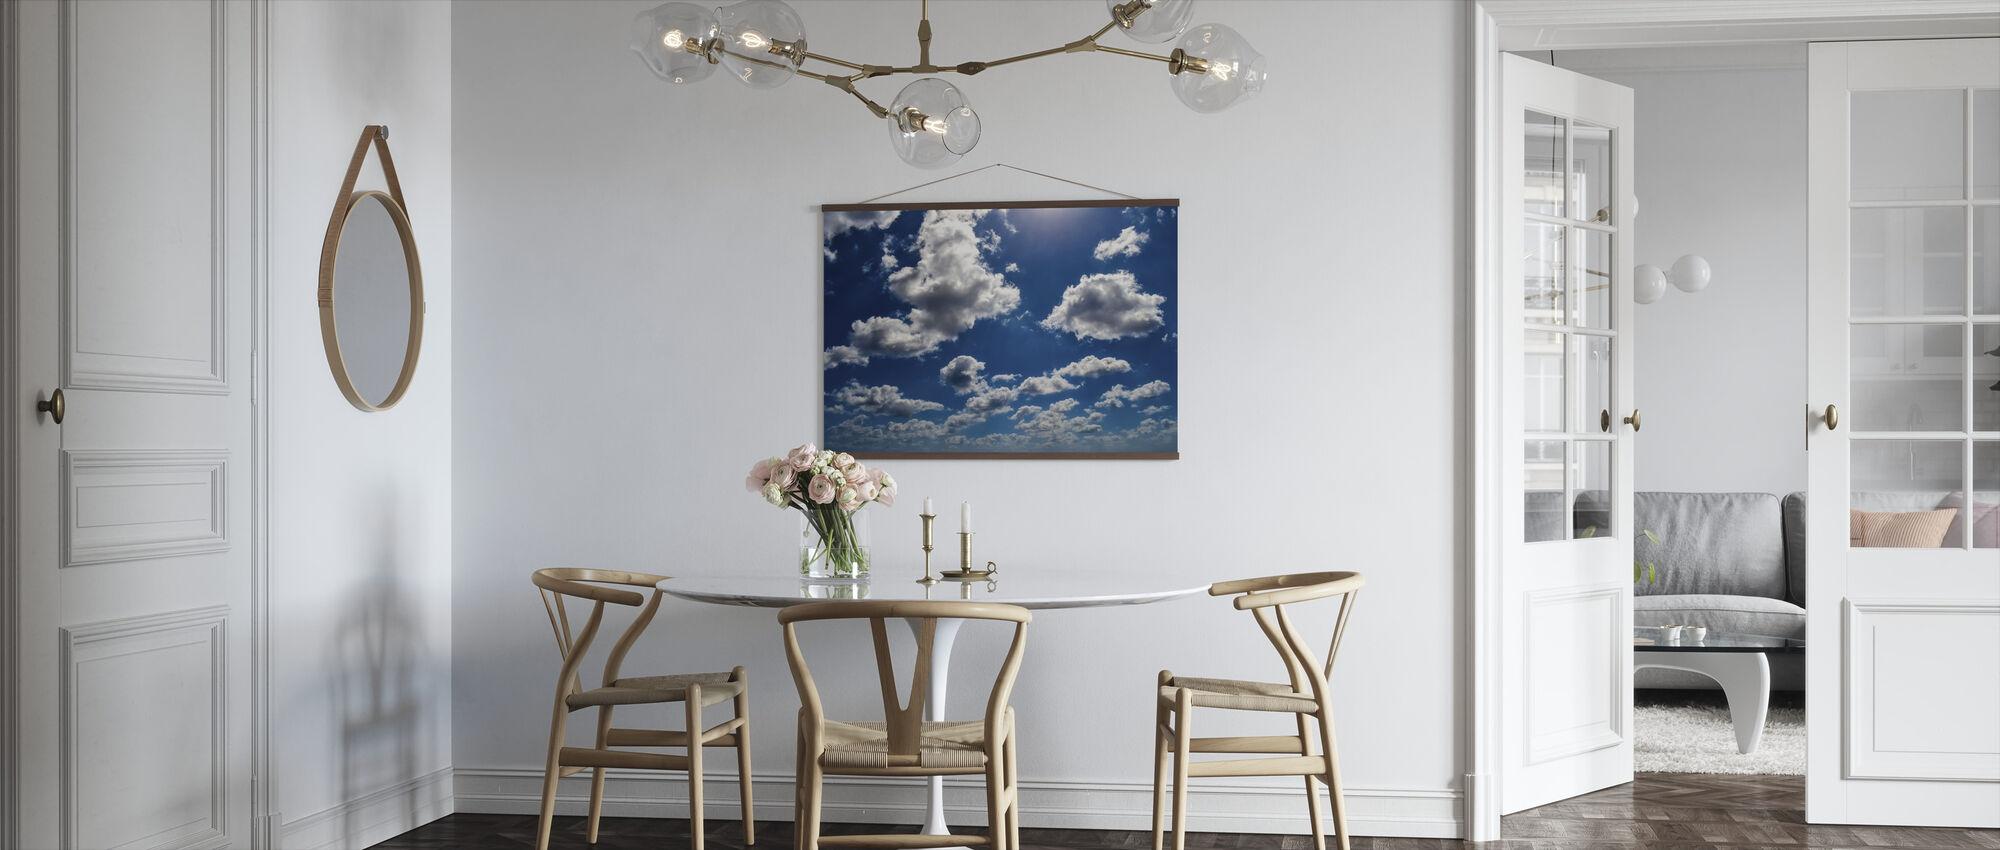 Blå himmel Moln - Poster - Kök